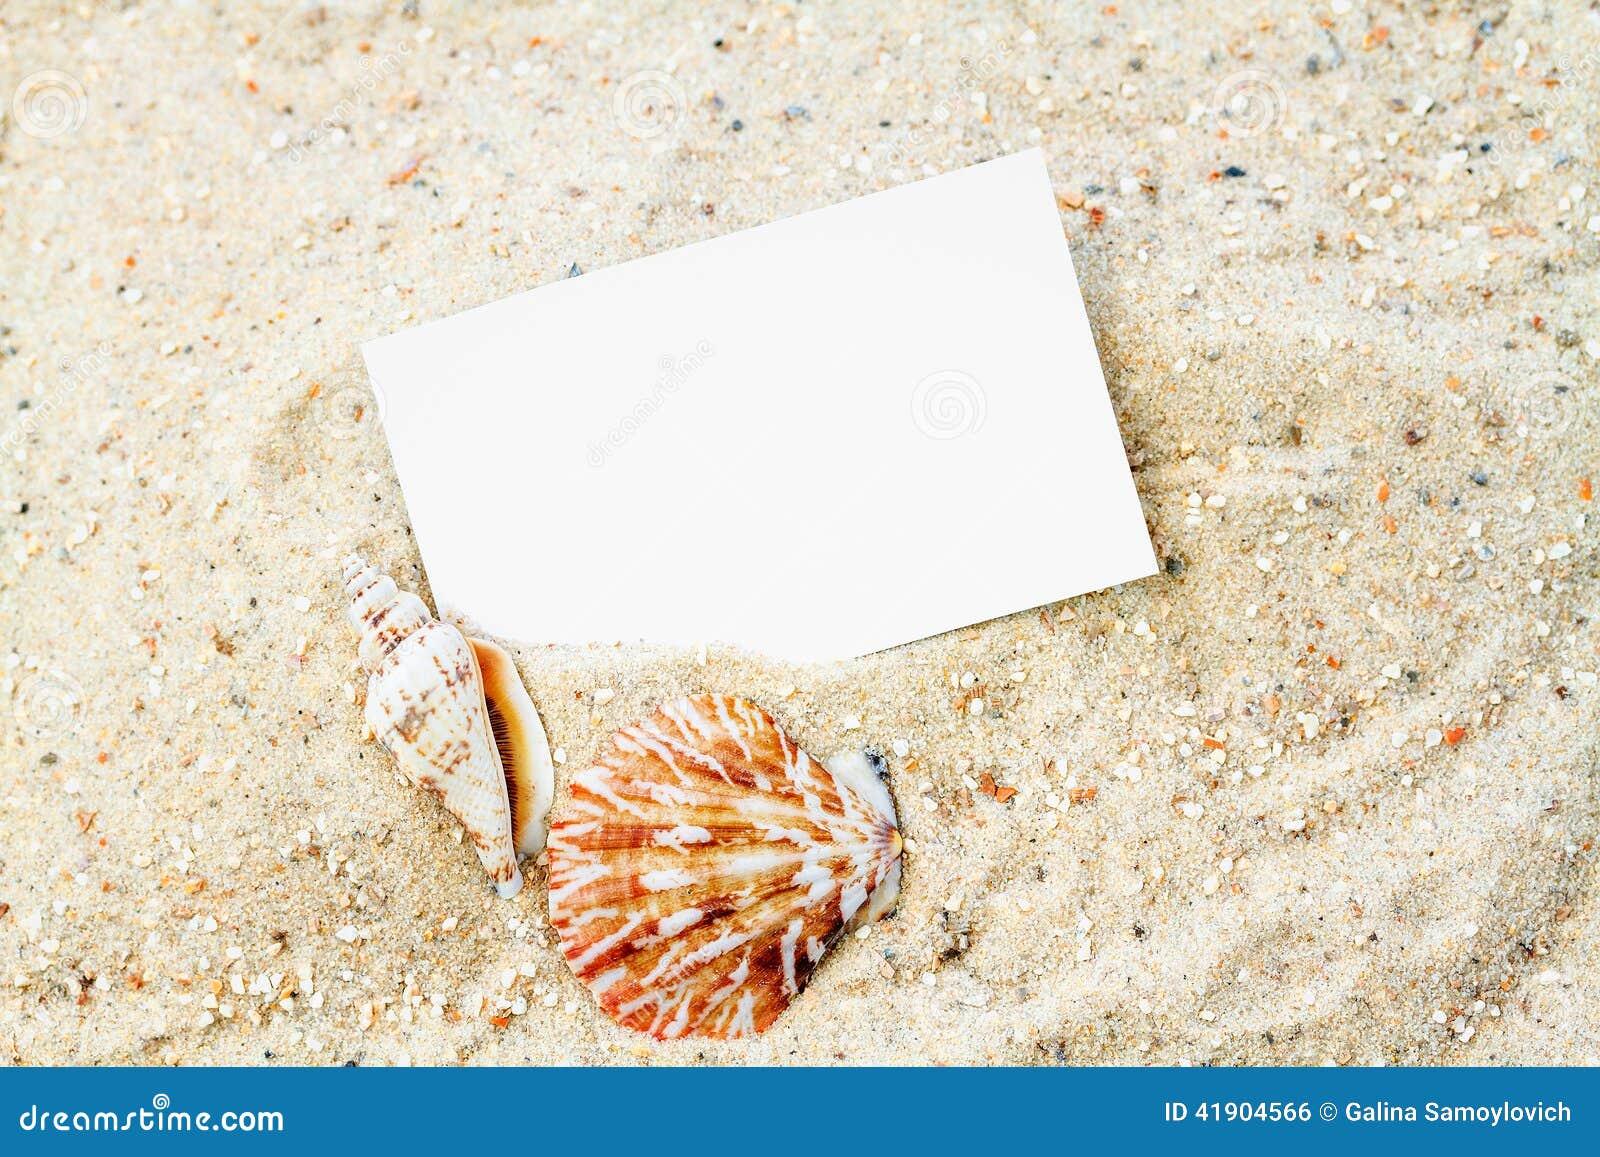 Conchas marinas con la tarjeta en blanco